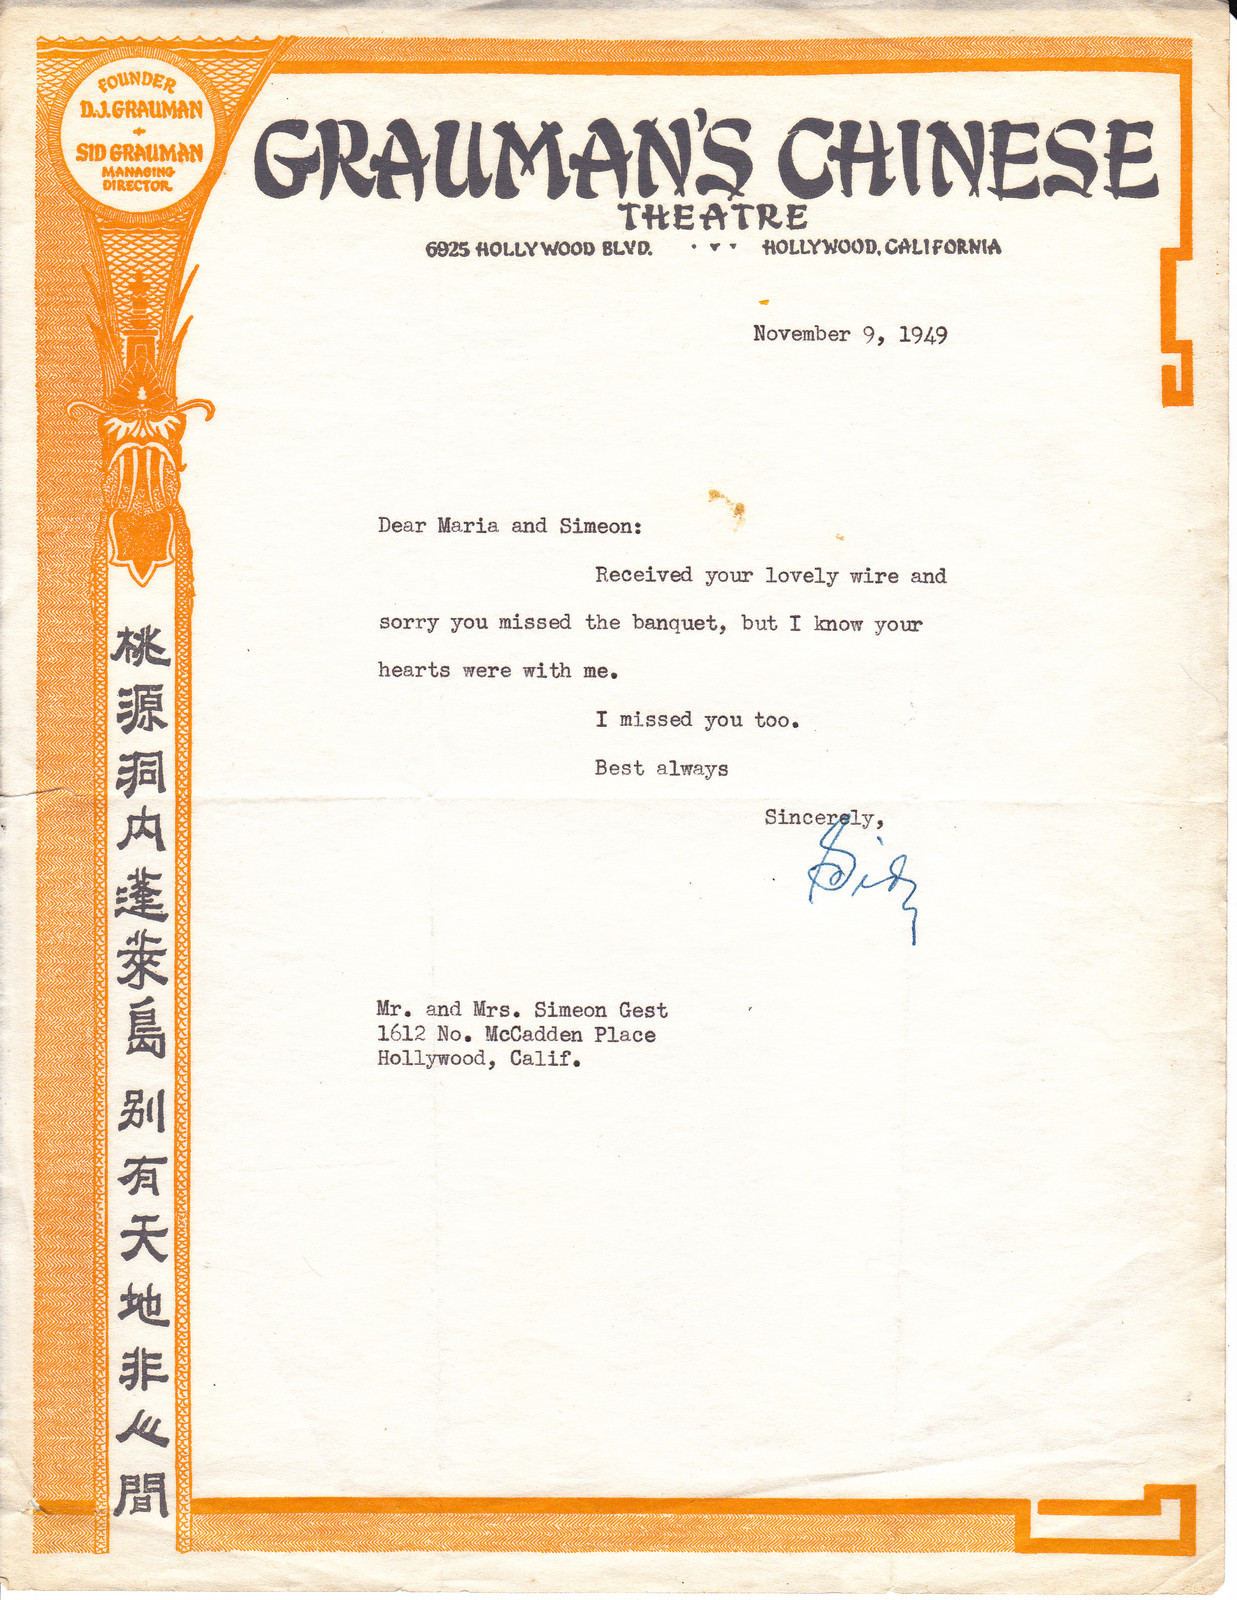 Grauman's Chinese Theatre vintage letterhead